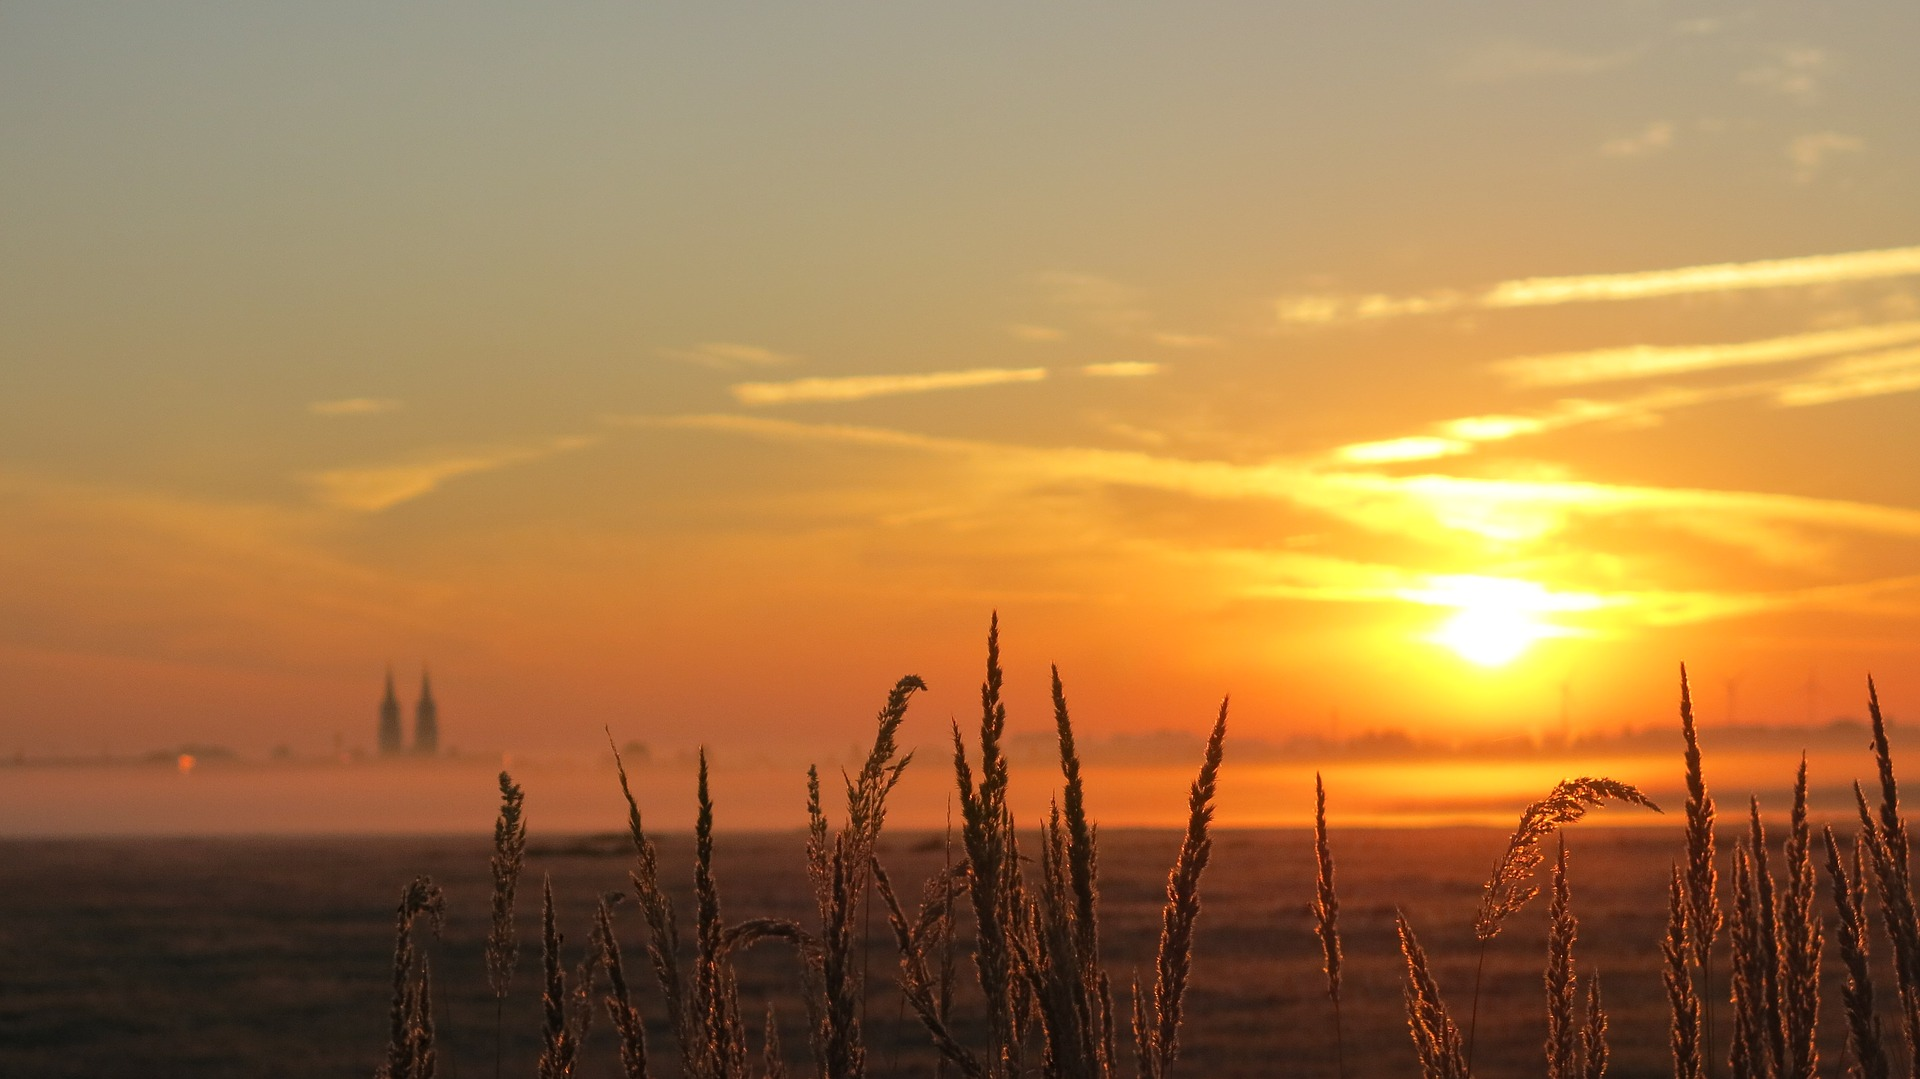 Abgeerntes Feld vor Sonnenuntergang (Oschatz)